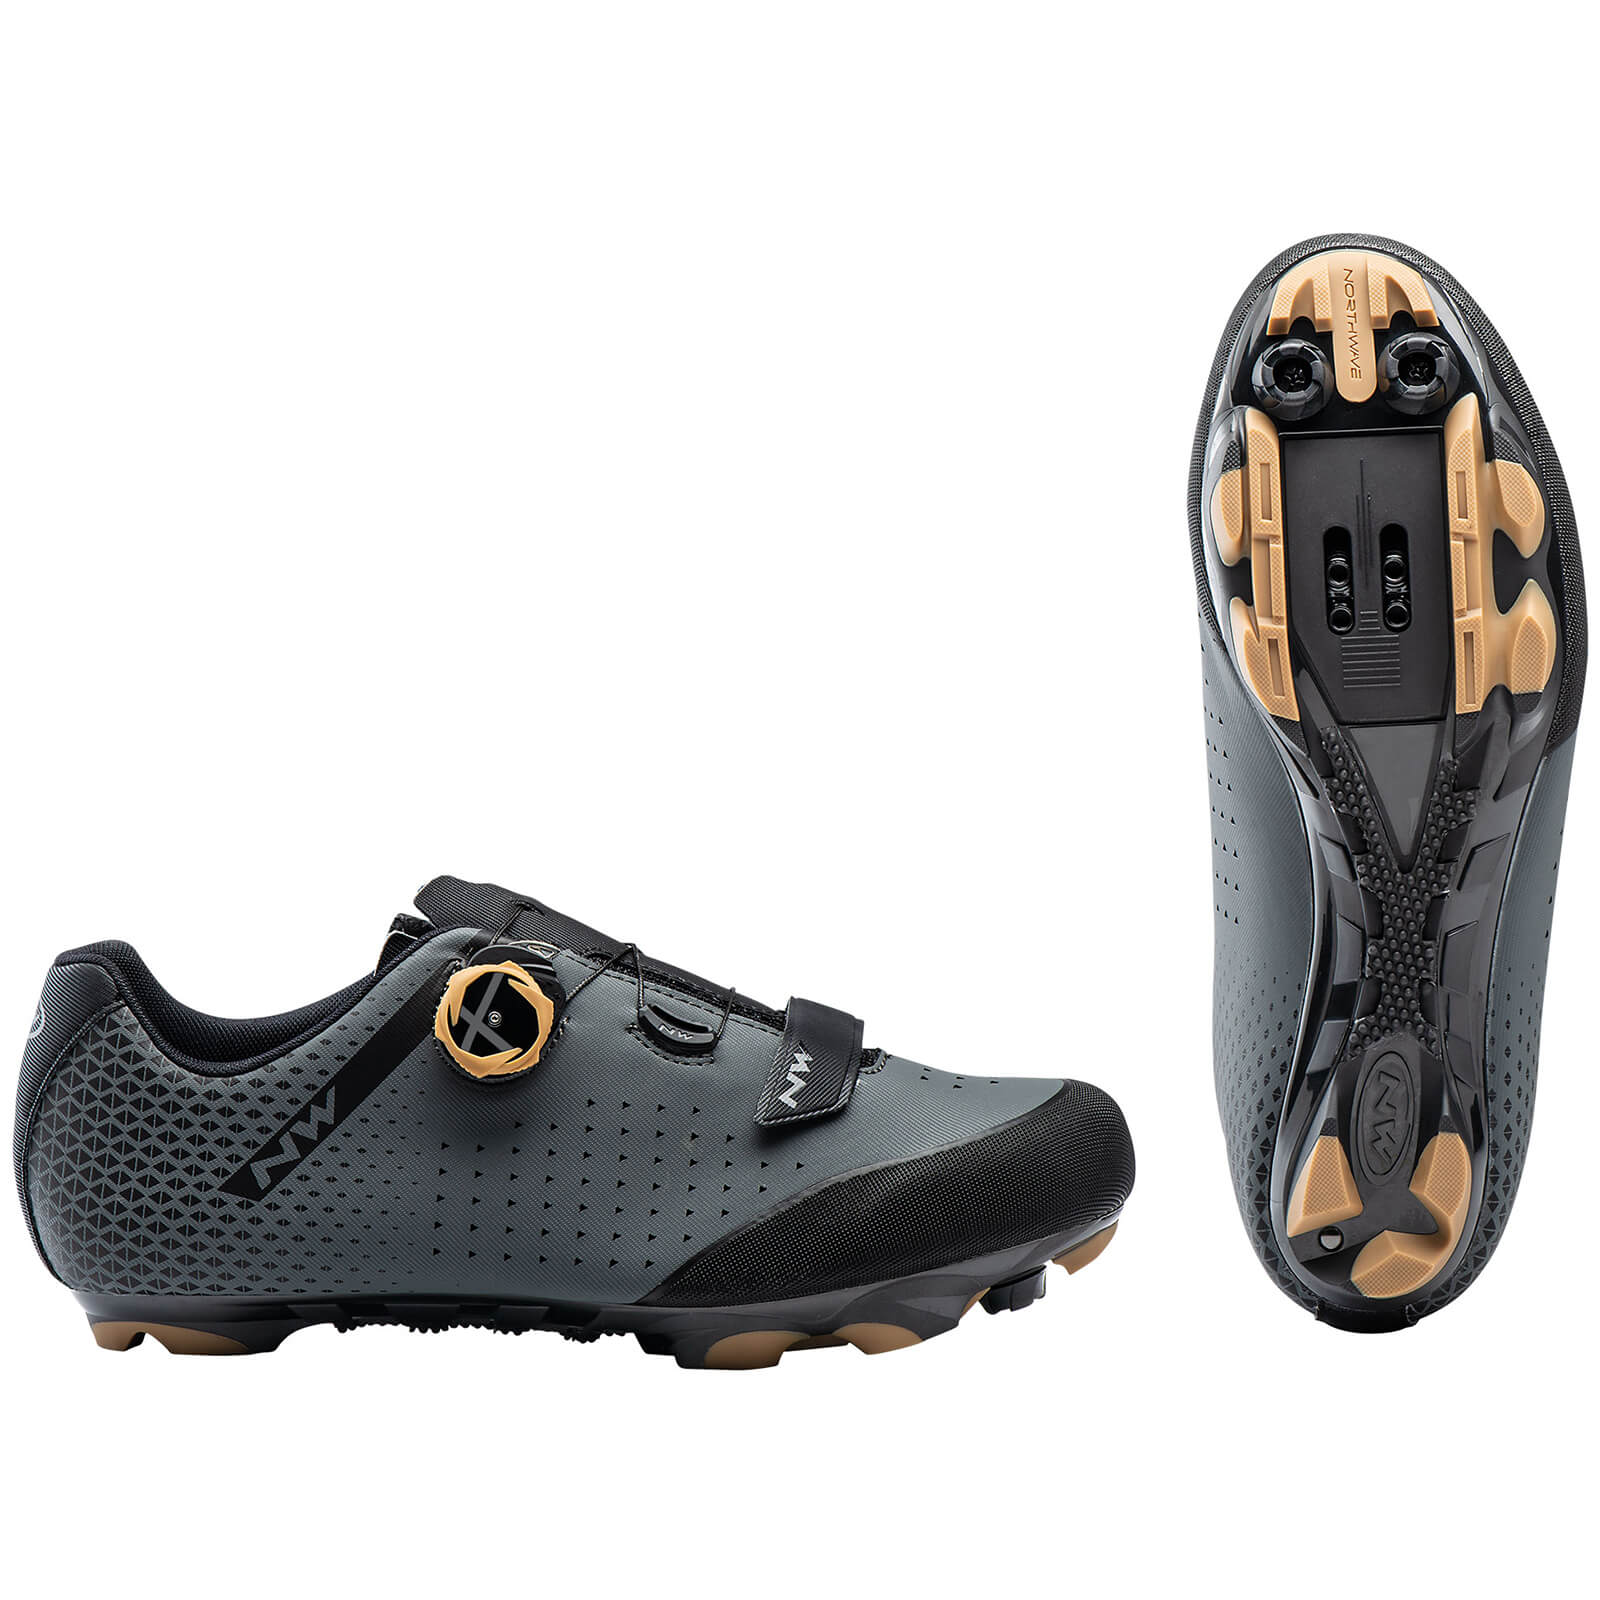 Northwave Origin Plus 2 MTB Shoes - EU40 - Antra/Honey